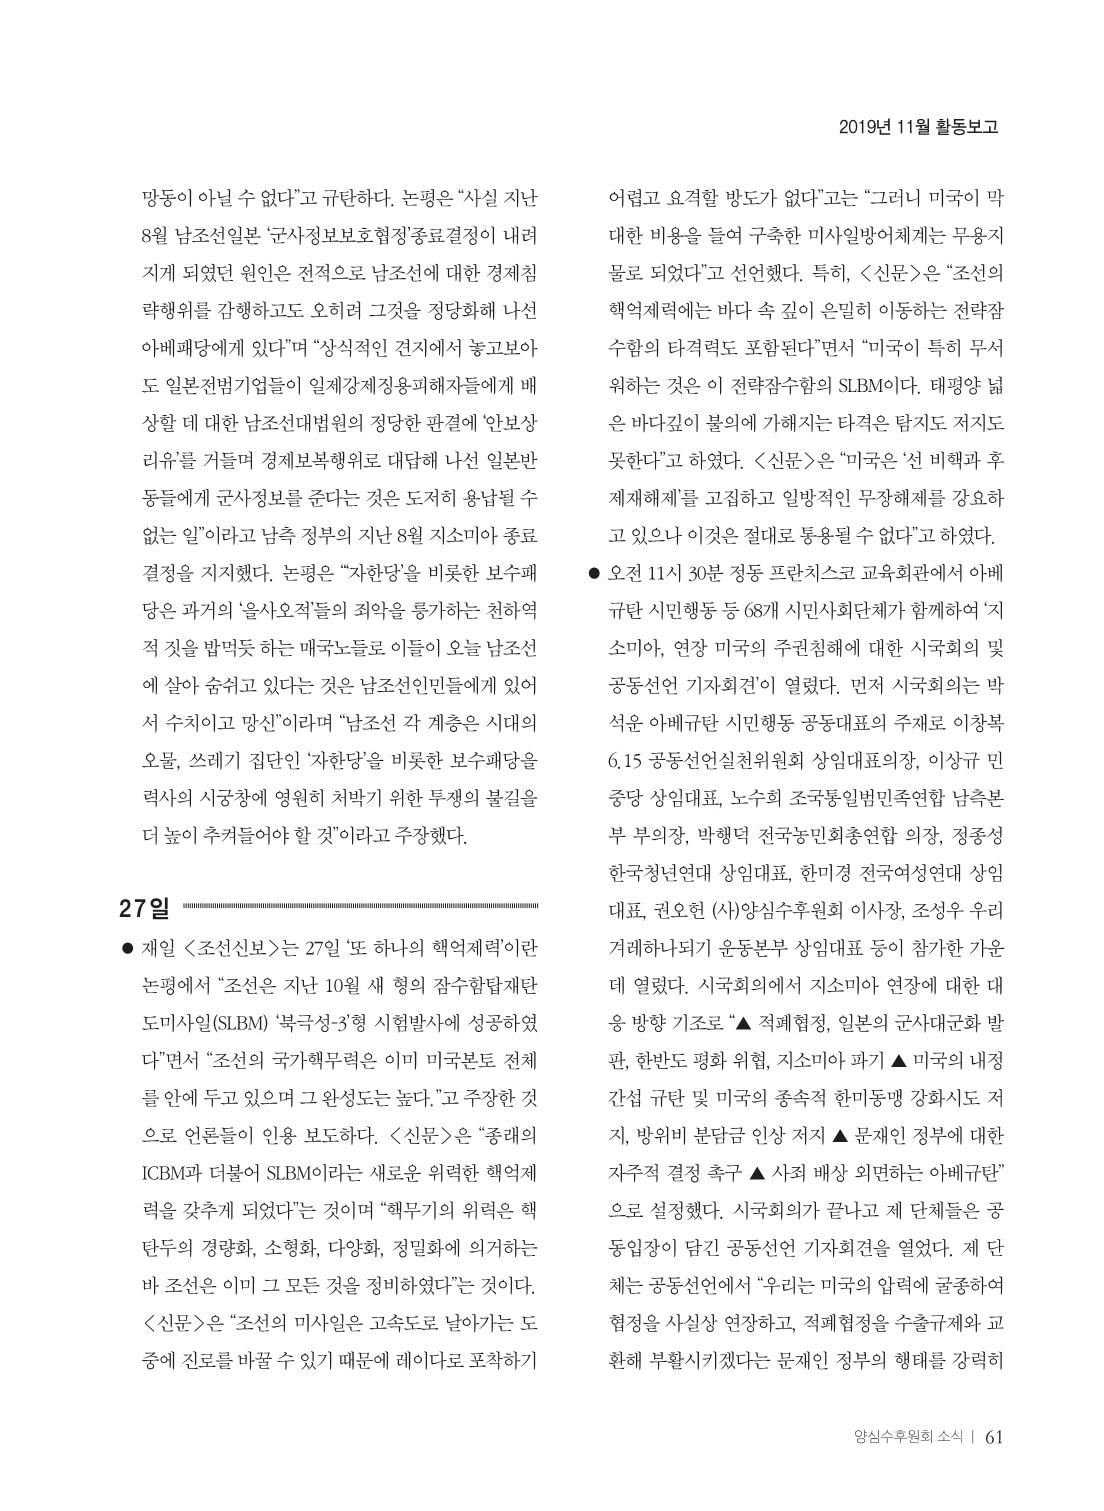 5802db1f-6a90-451c-ac2e-da2a23bee939.pdf-0063.jpg